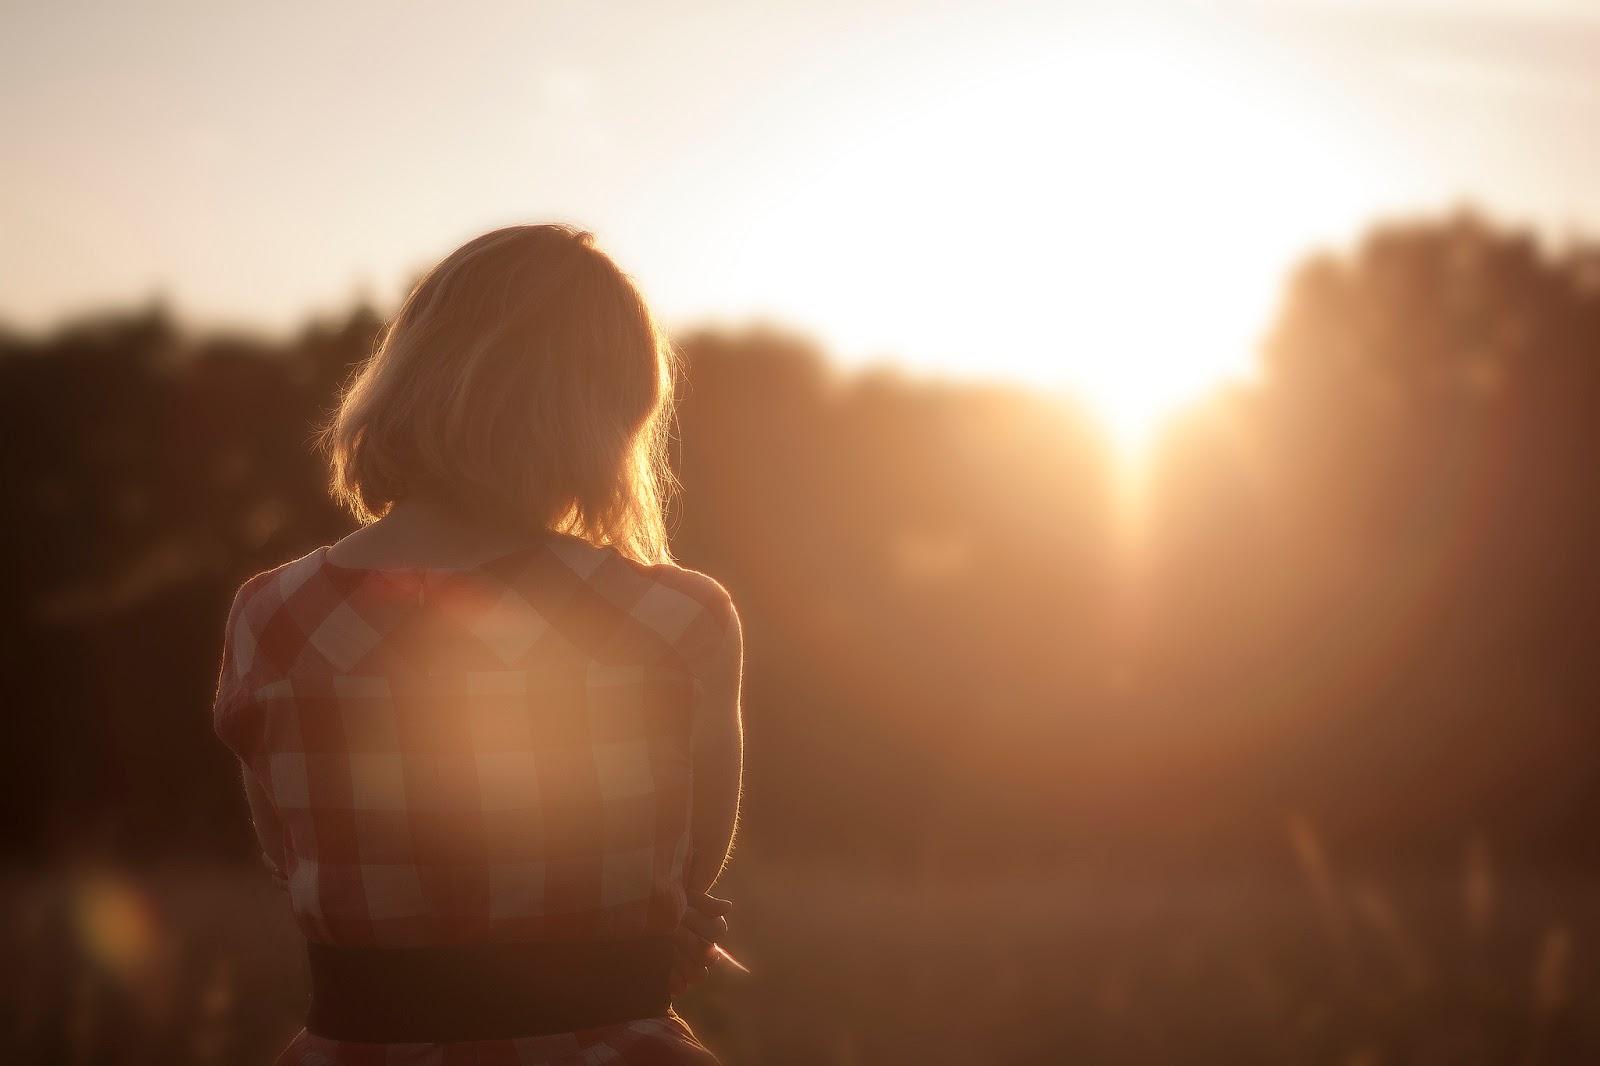 Mindfulness Chade Meng libro busca en tu interior